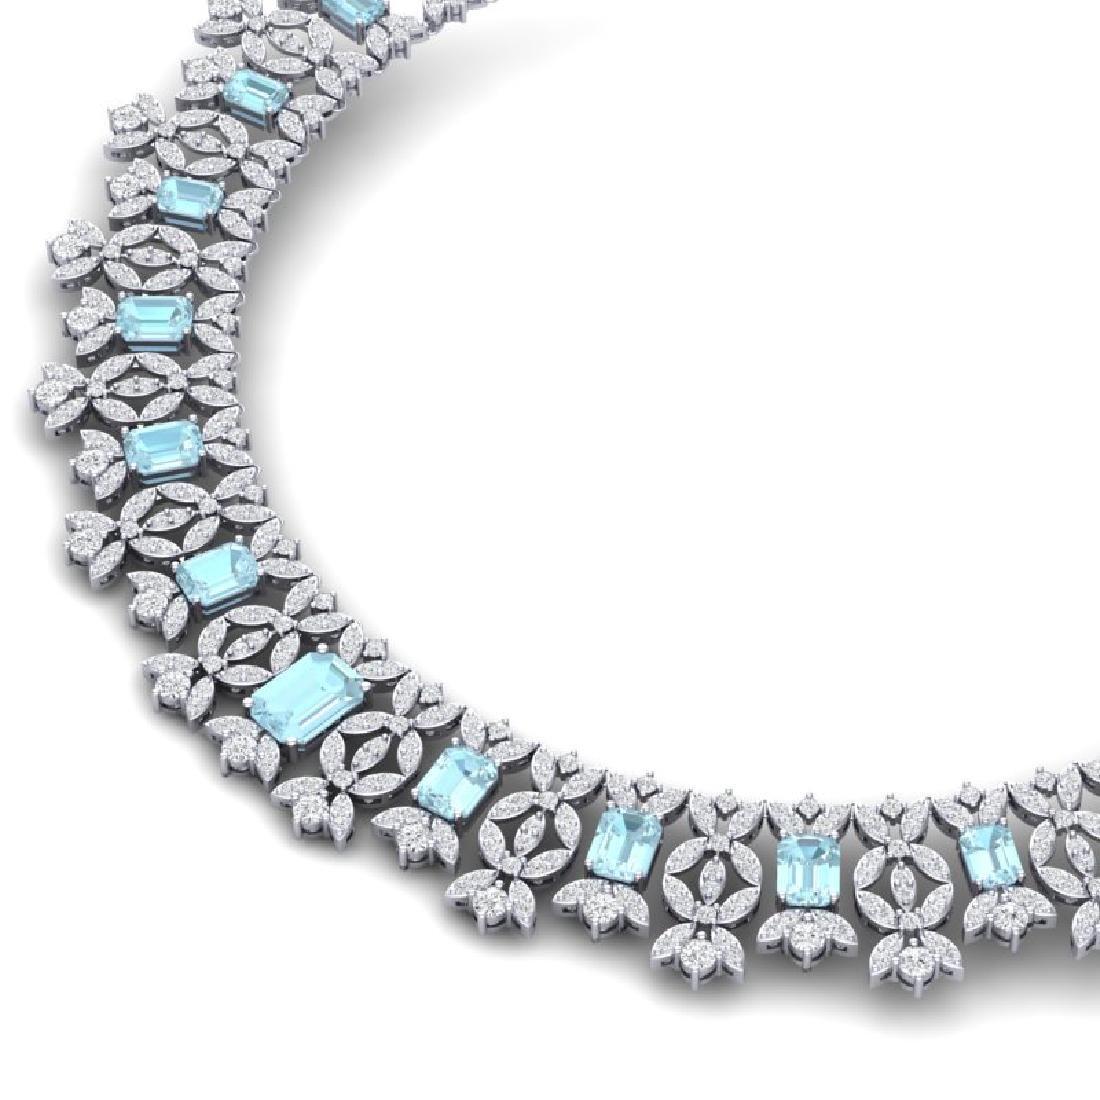 53.14 CTW Royalty Sky Topaz & VS Diamond Necklace 18K - 2